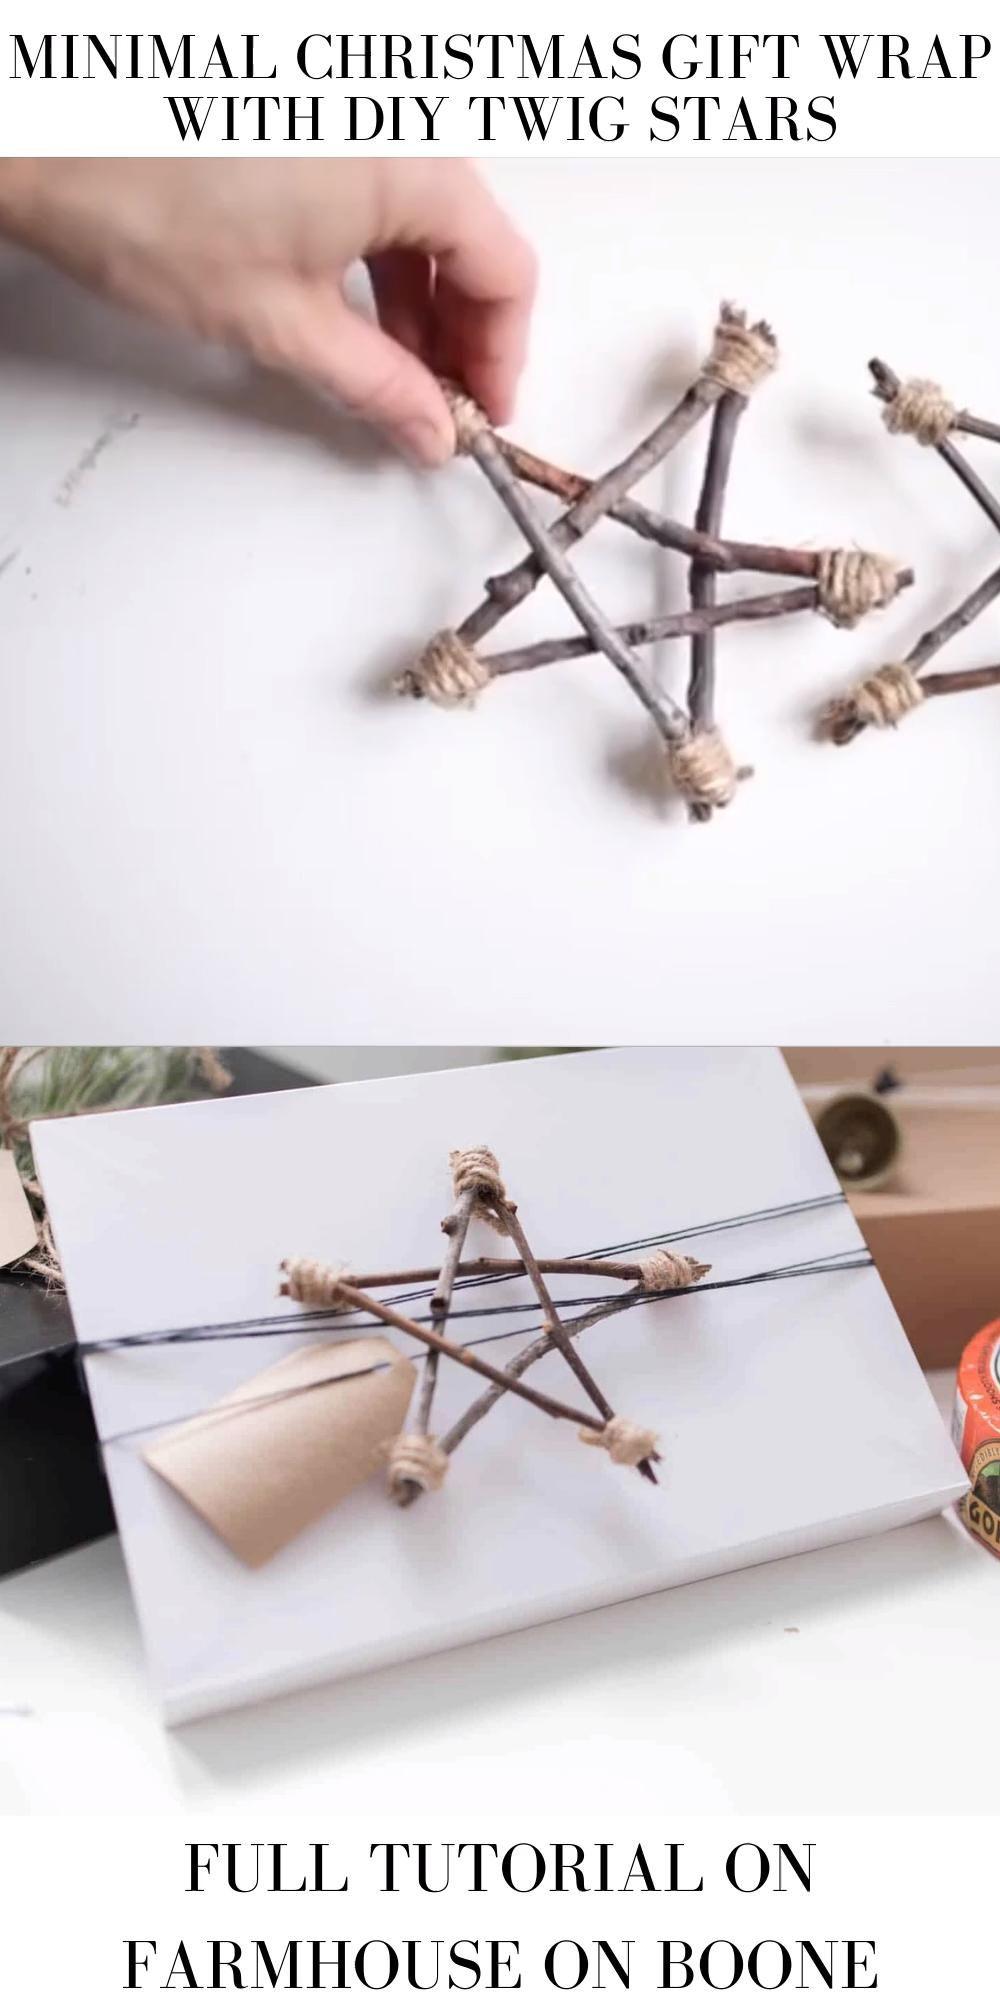 Photo of Minimal Christmas Gift Wrap With DIY Twig Stars